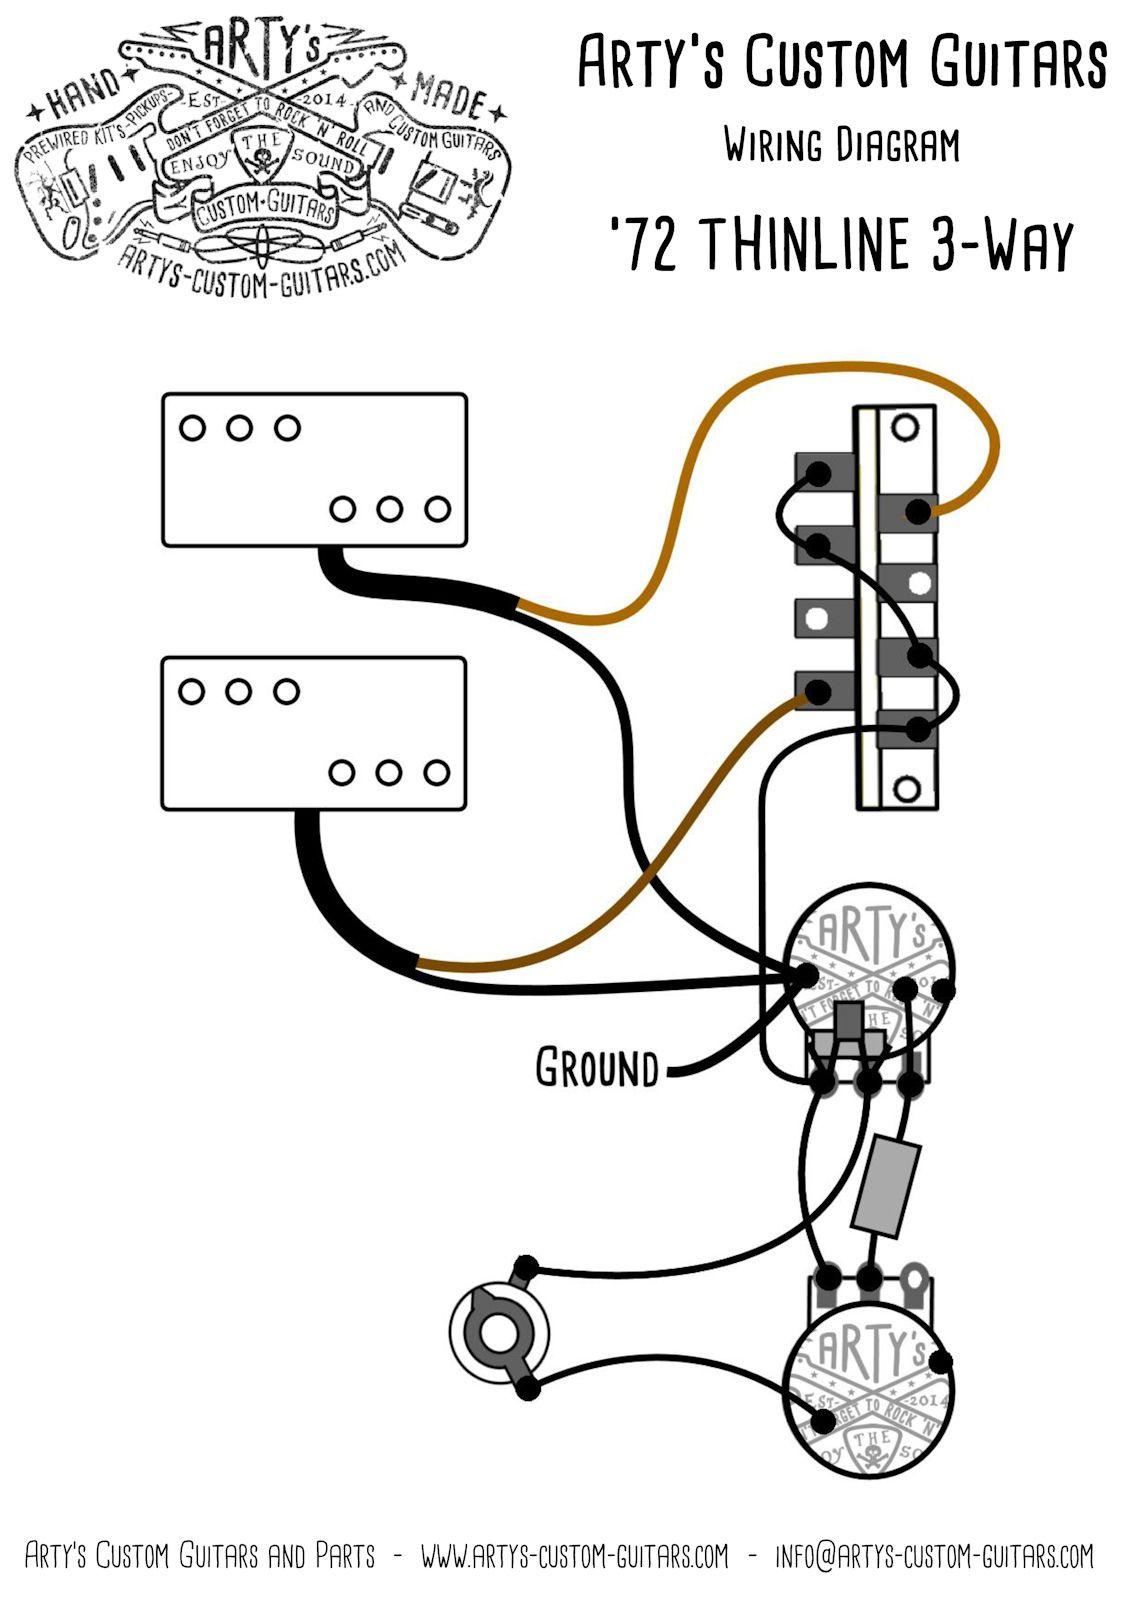 Squier Telecaster Wrhb Wiring Diagram